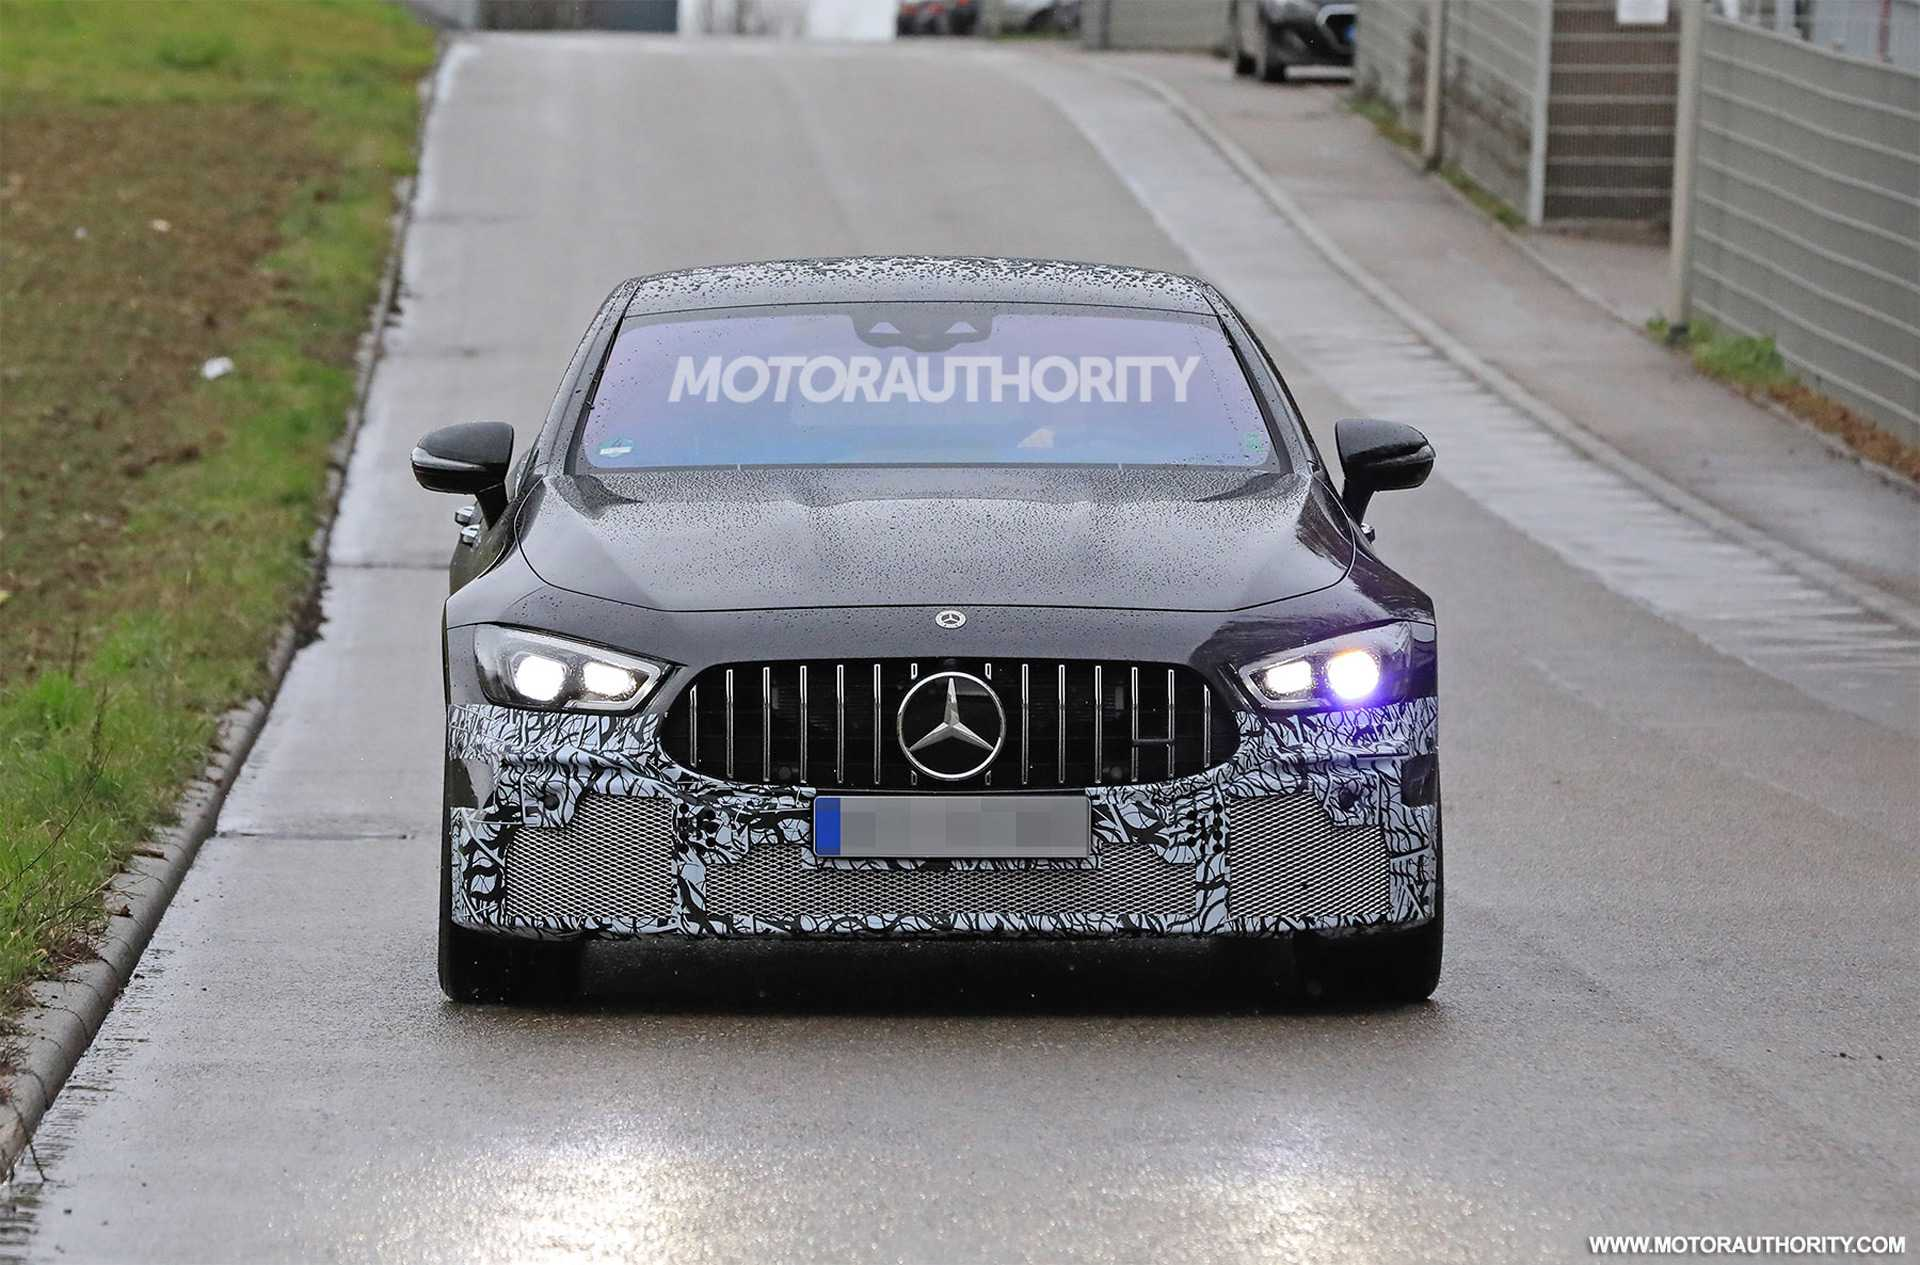 2022 Mercedes Benz AMG GT73e Four-Door PHEV Coming Soon, Spy Shots In